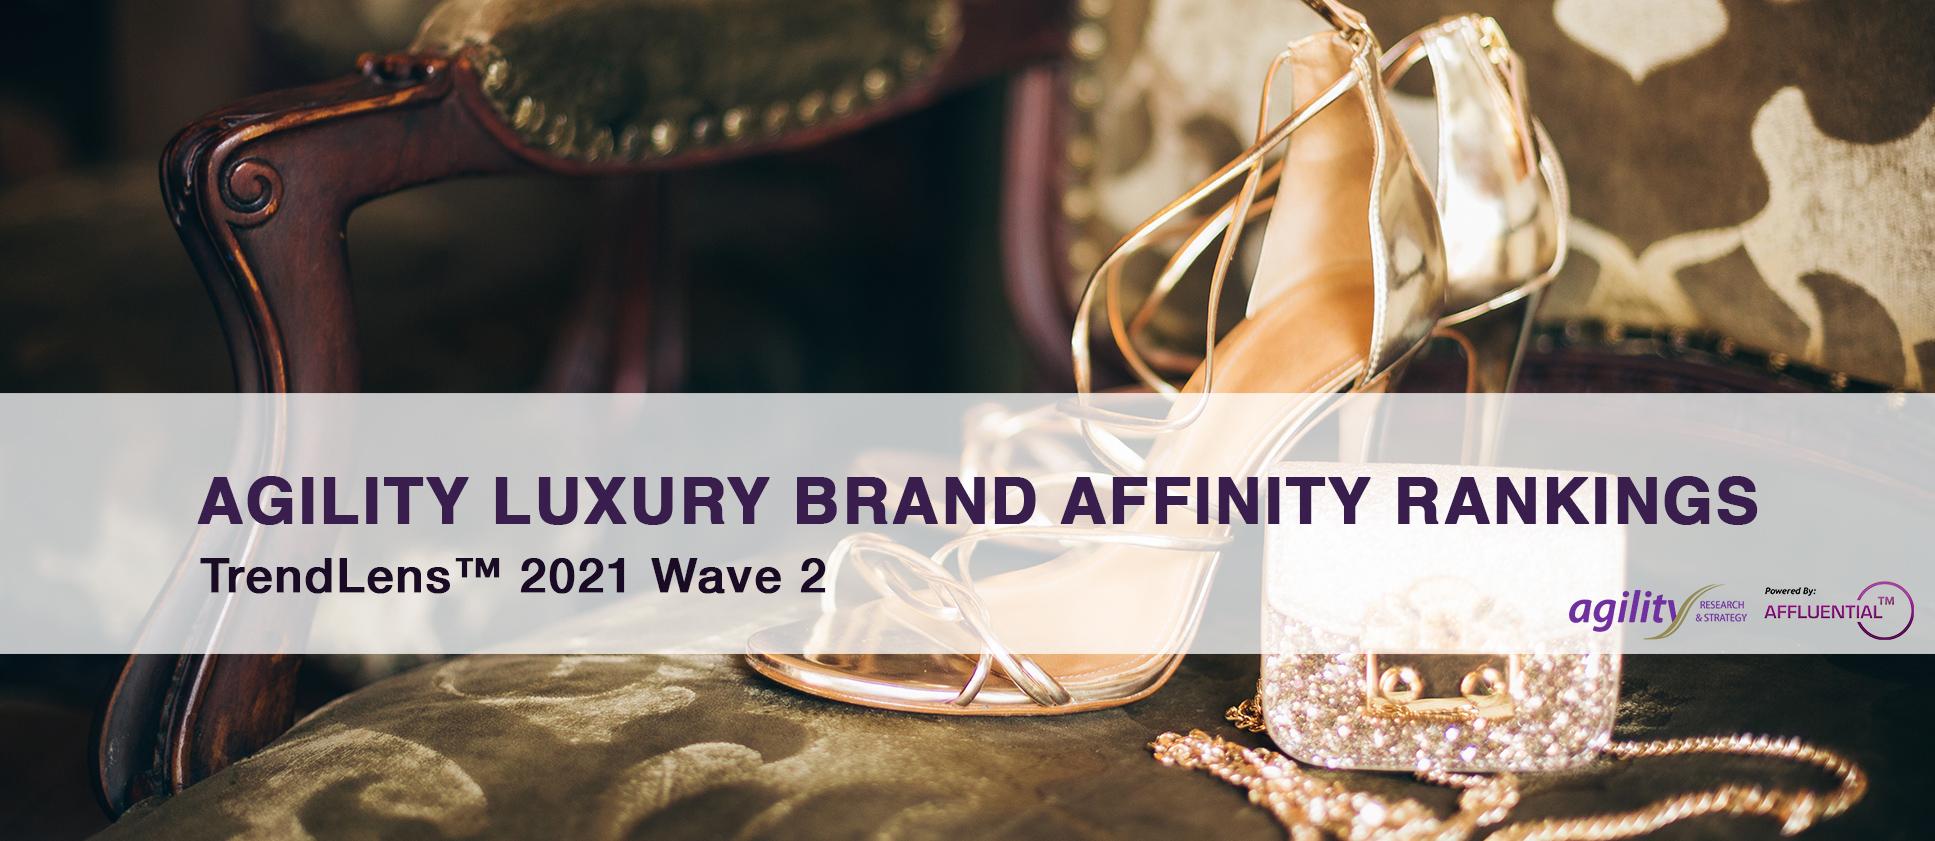 Agility Luxury Brand Affinity Rankings 2021